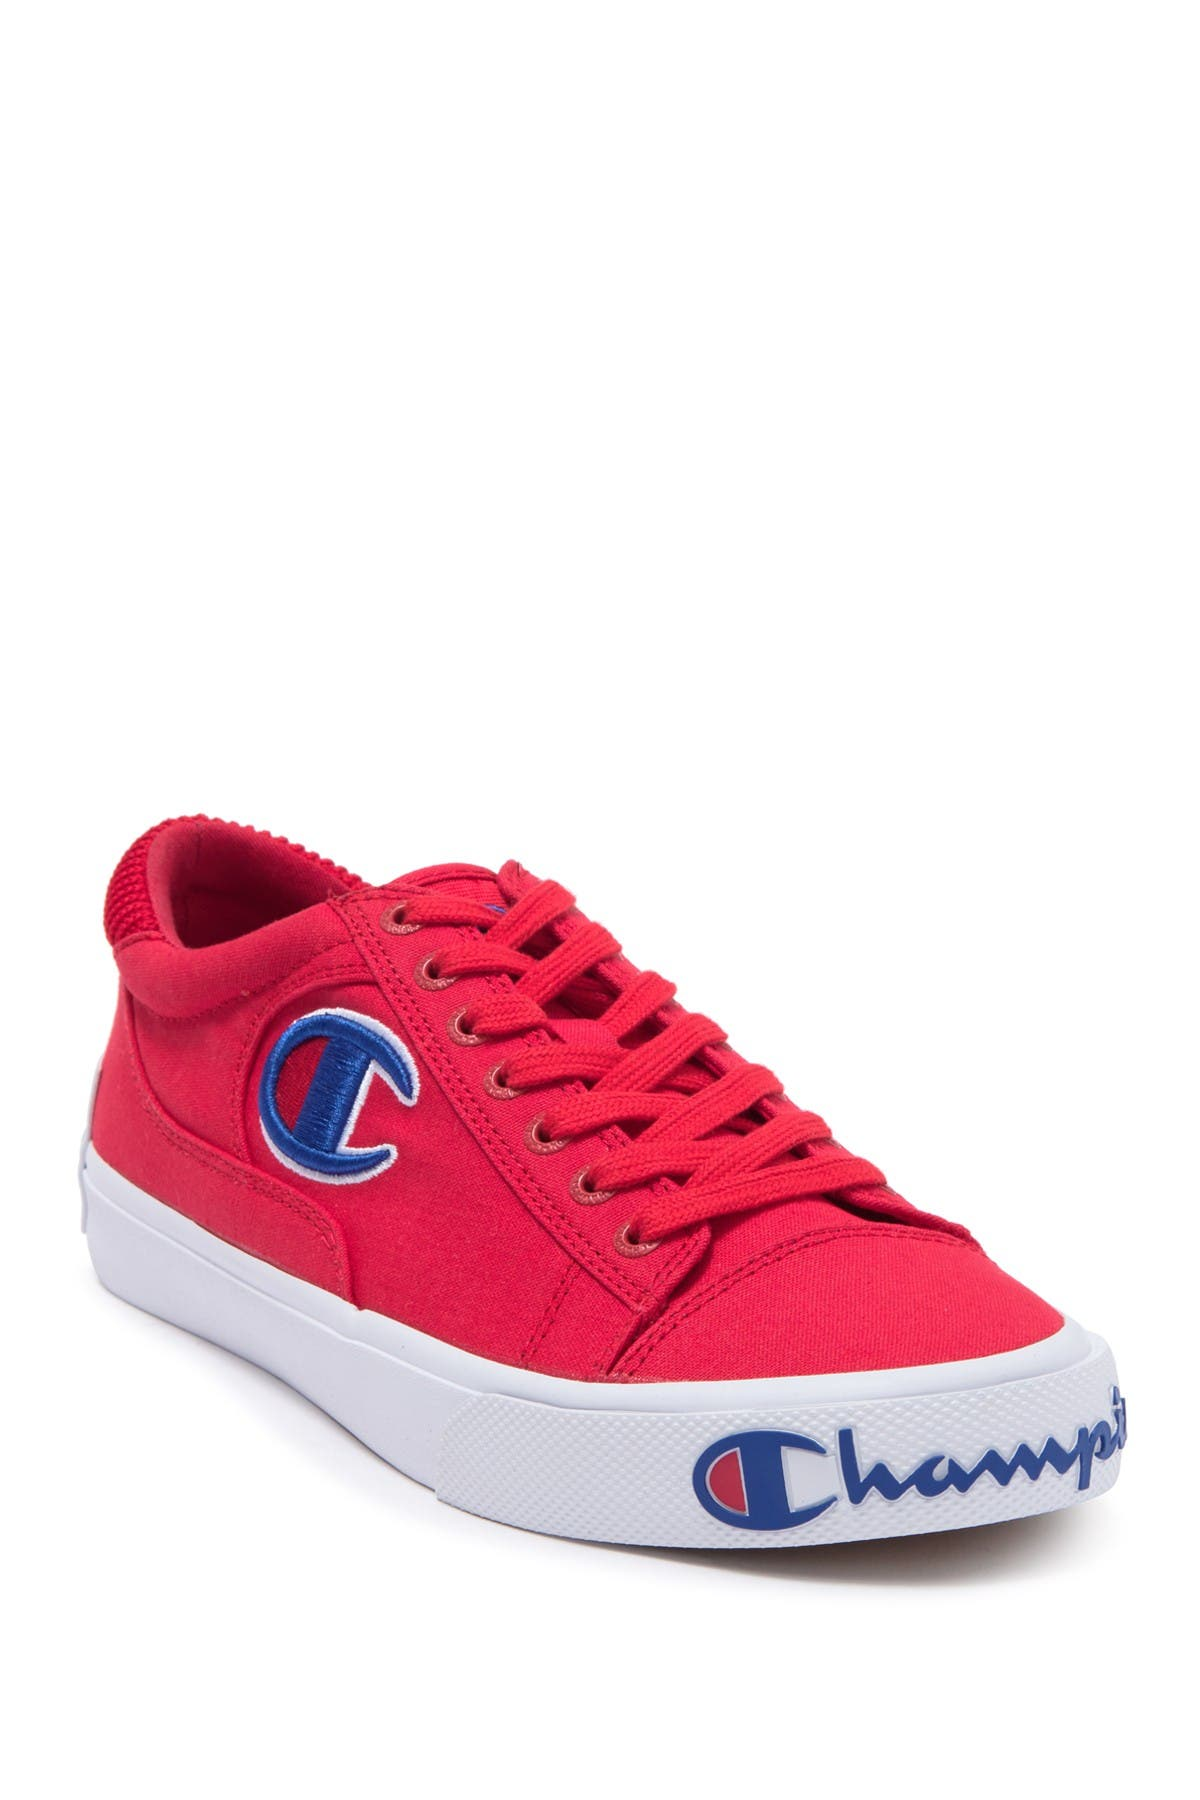 Image of Champion Fringe Low Top Sneaker